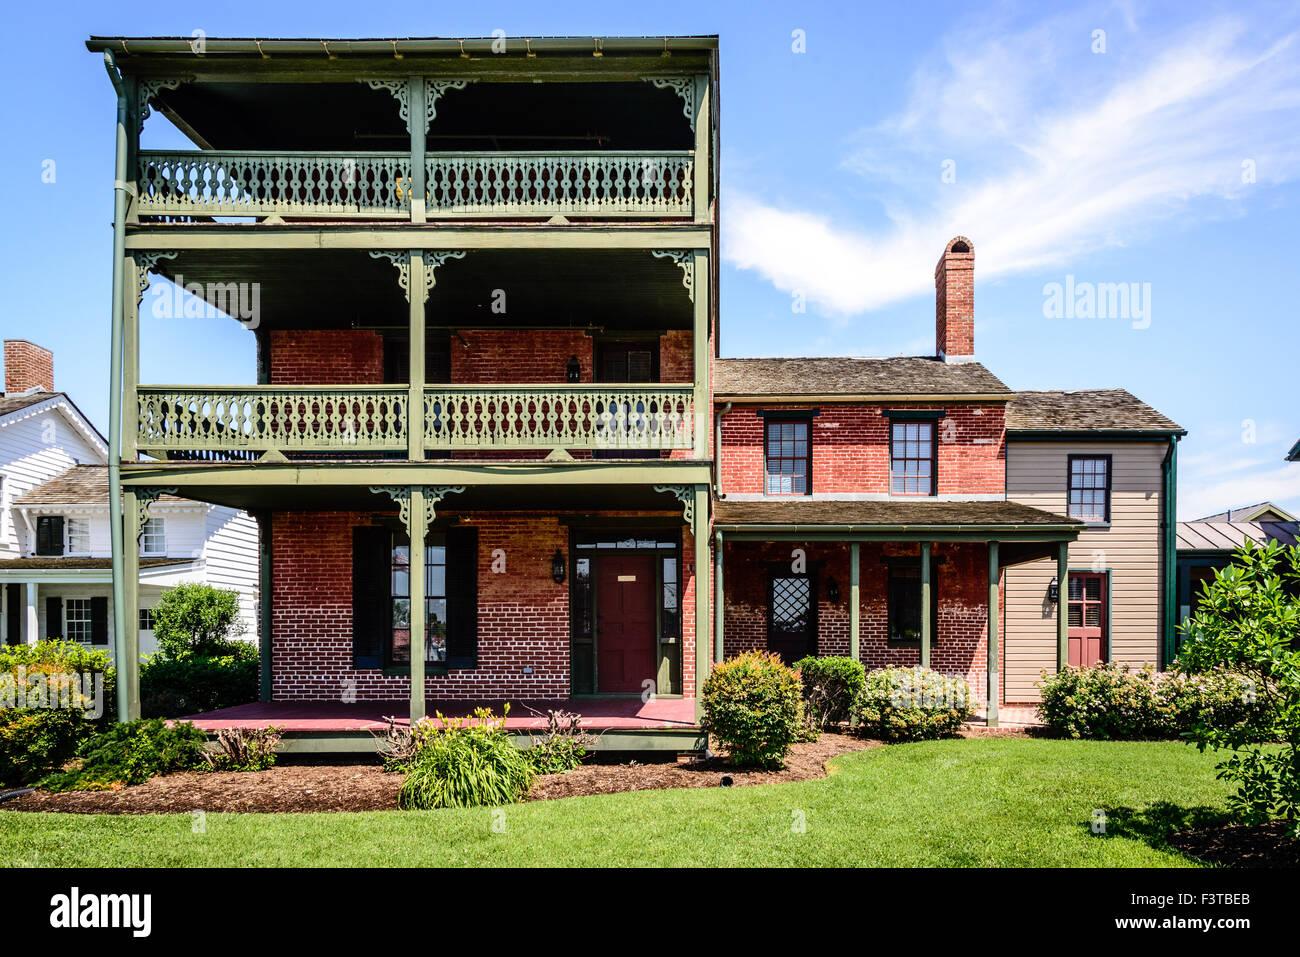 Dodson House, Navy Point Historic Houses, Chesapeake Bay Maritime Museum, St. Michaels, Maryland Stock Photo